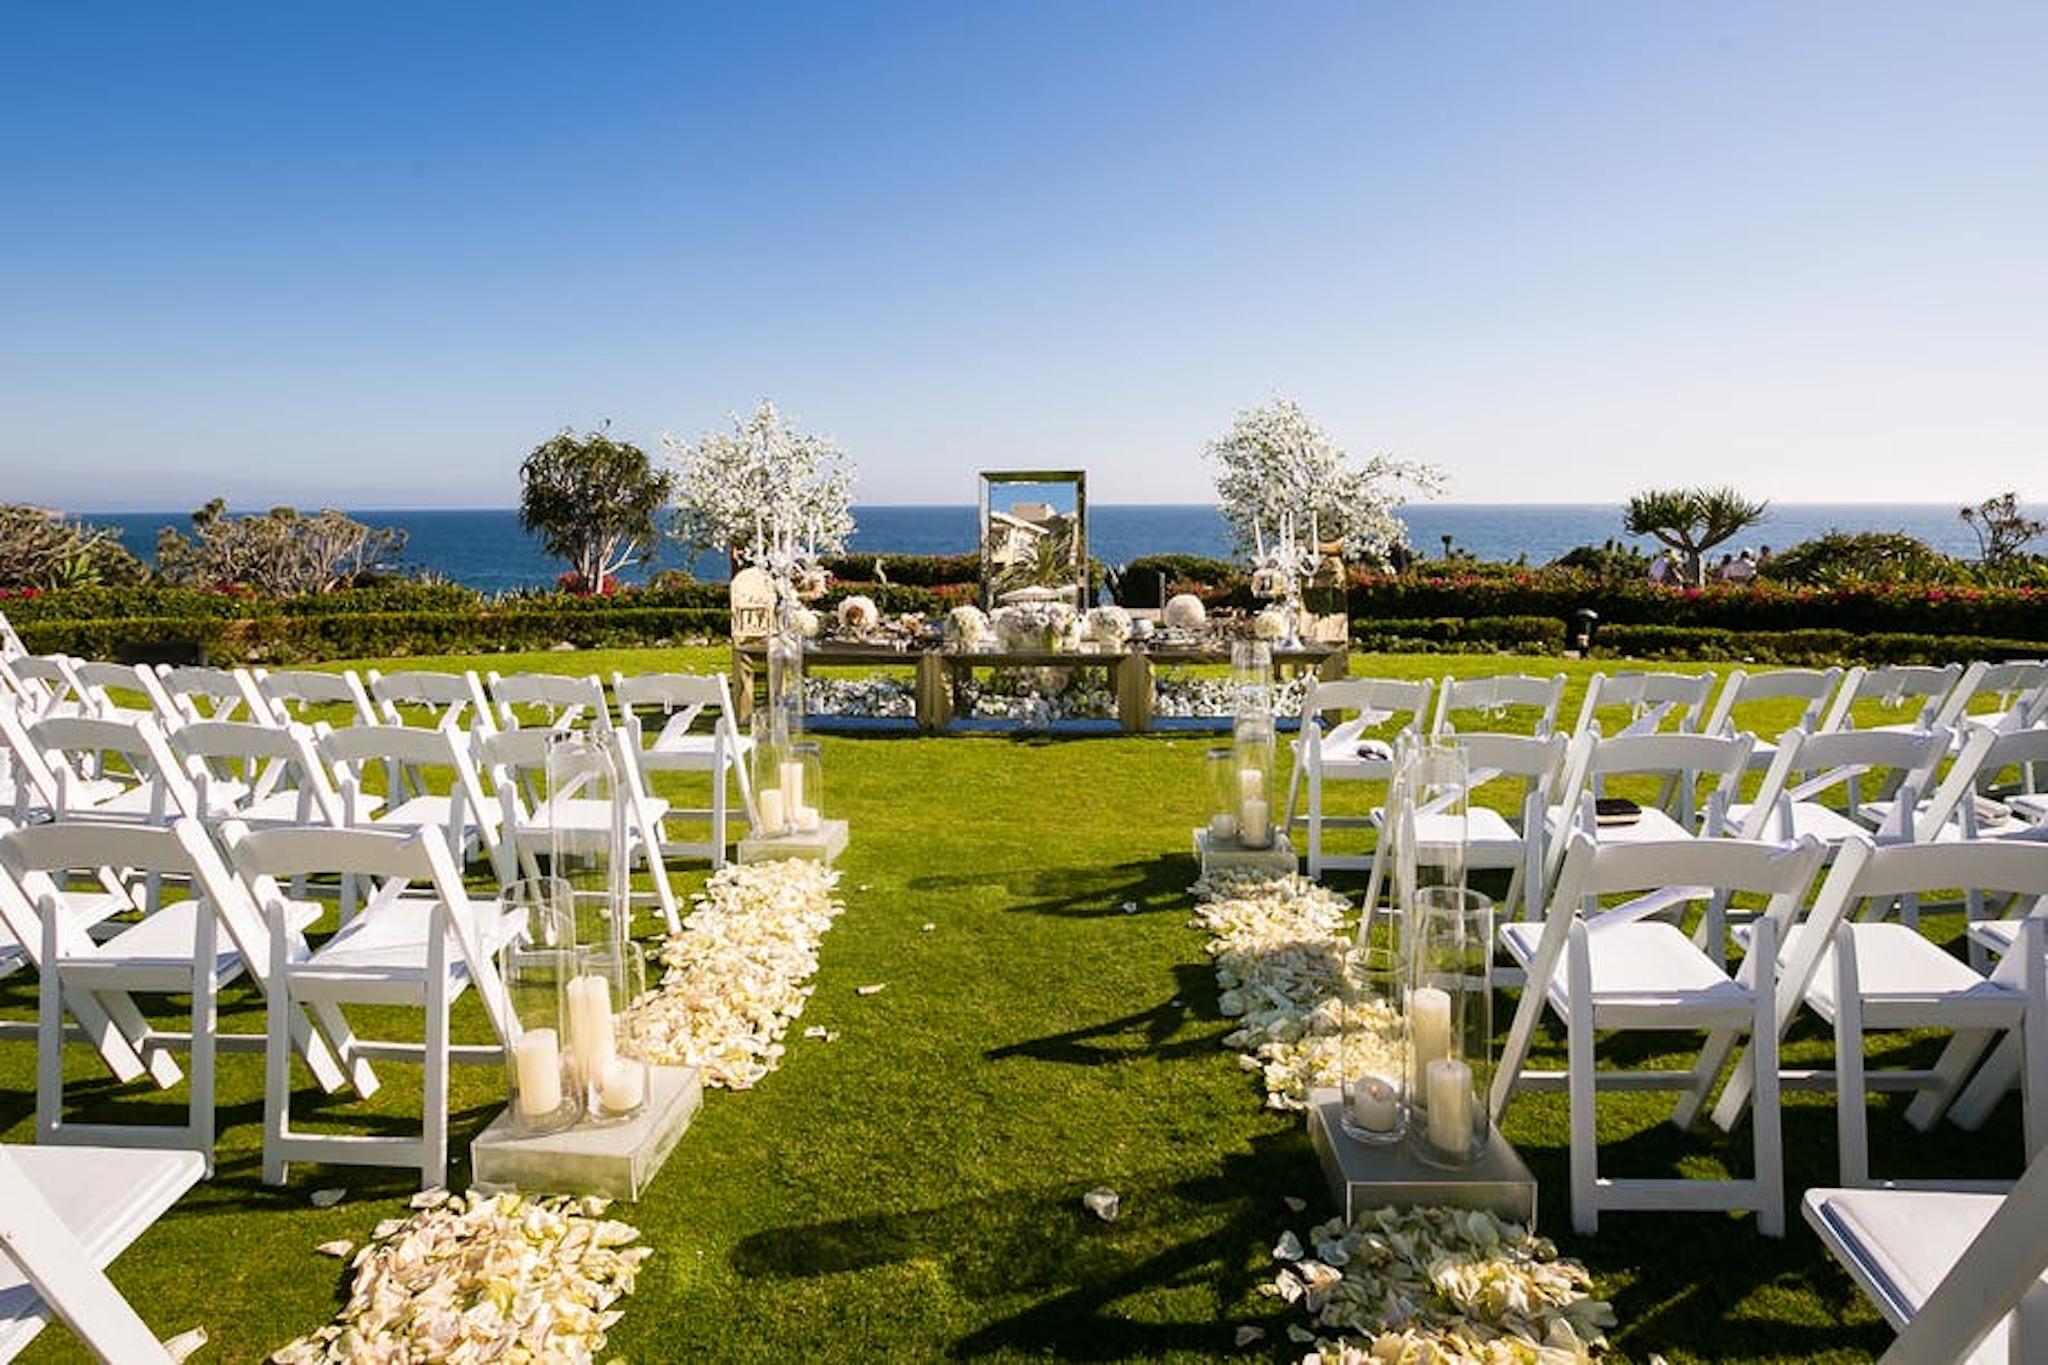 Outdoor wedding venue at Montage Laguna Beach